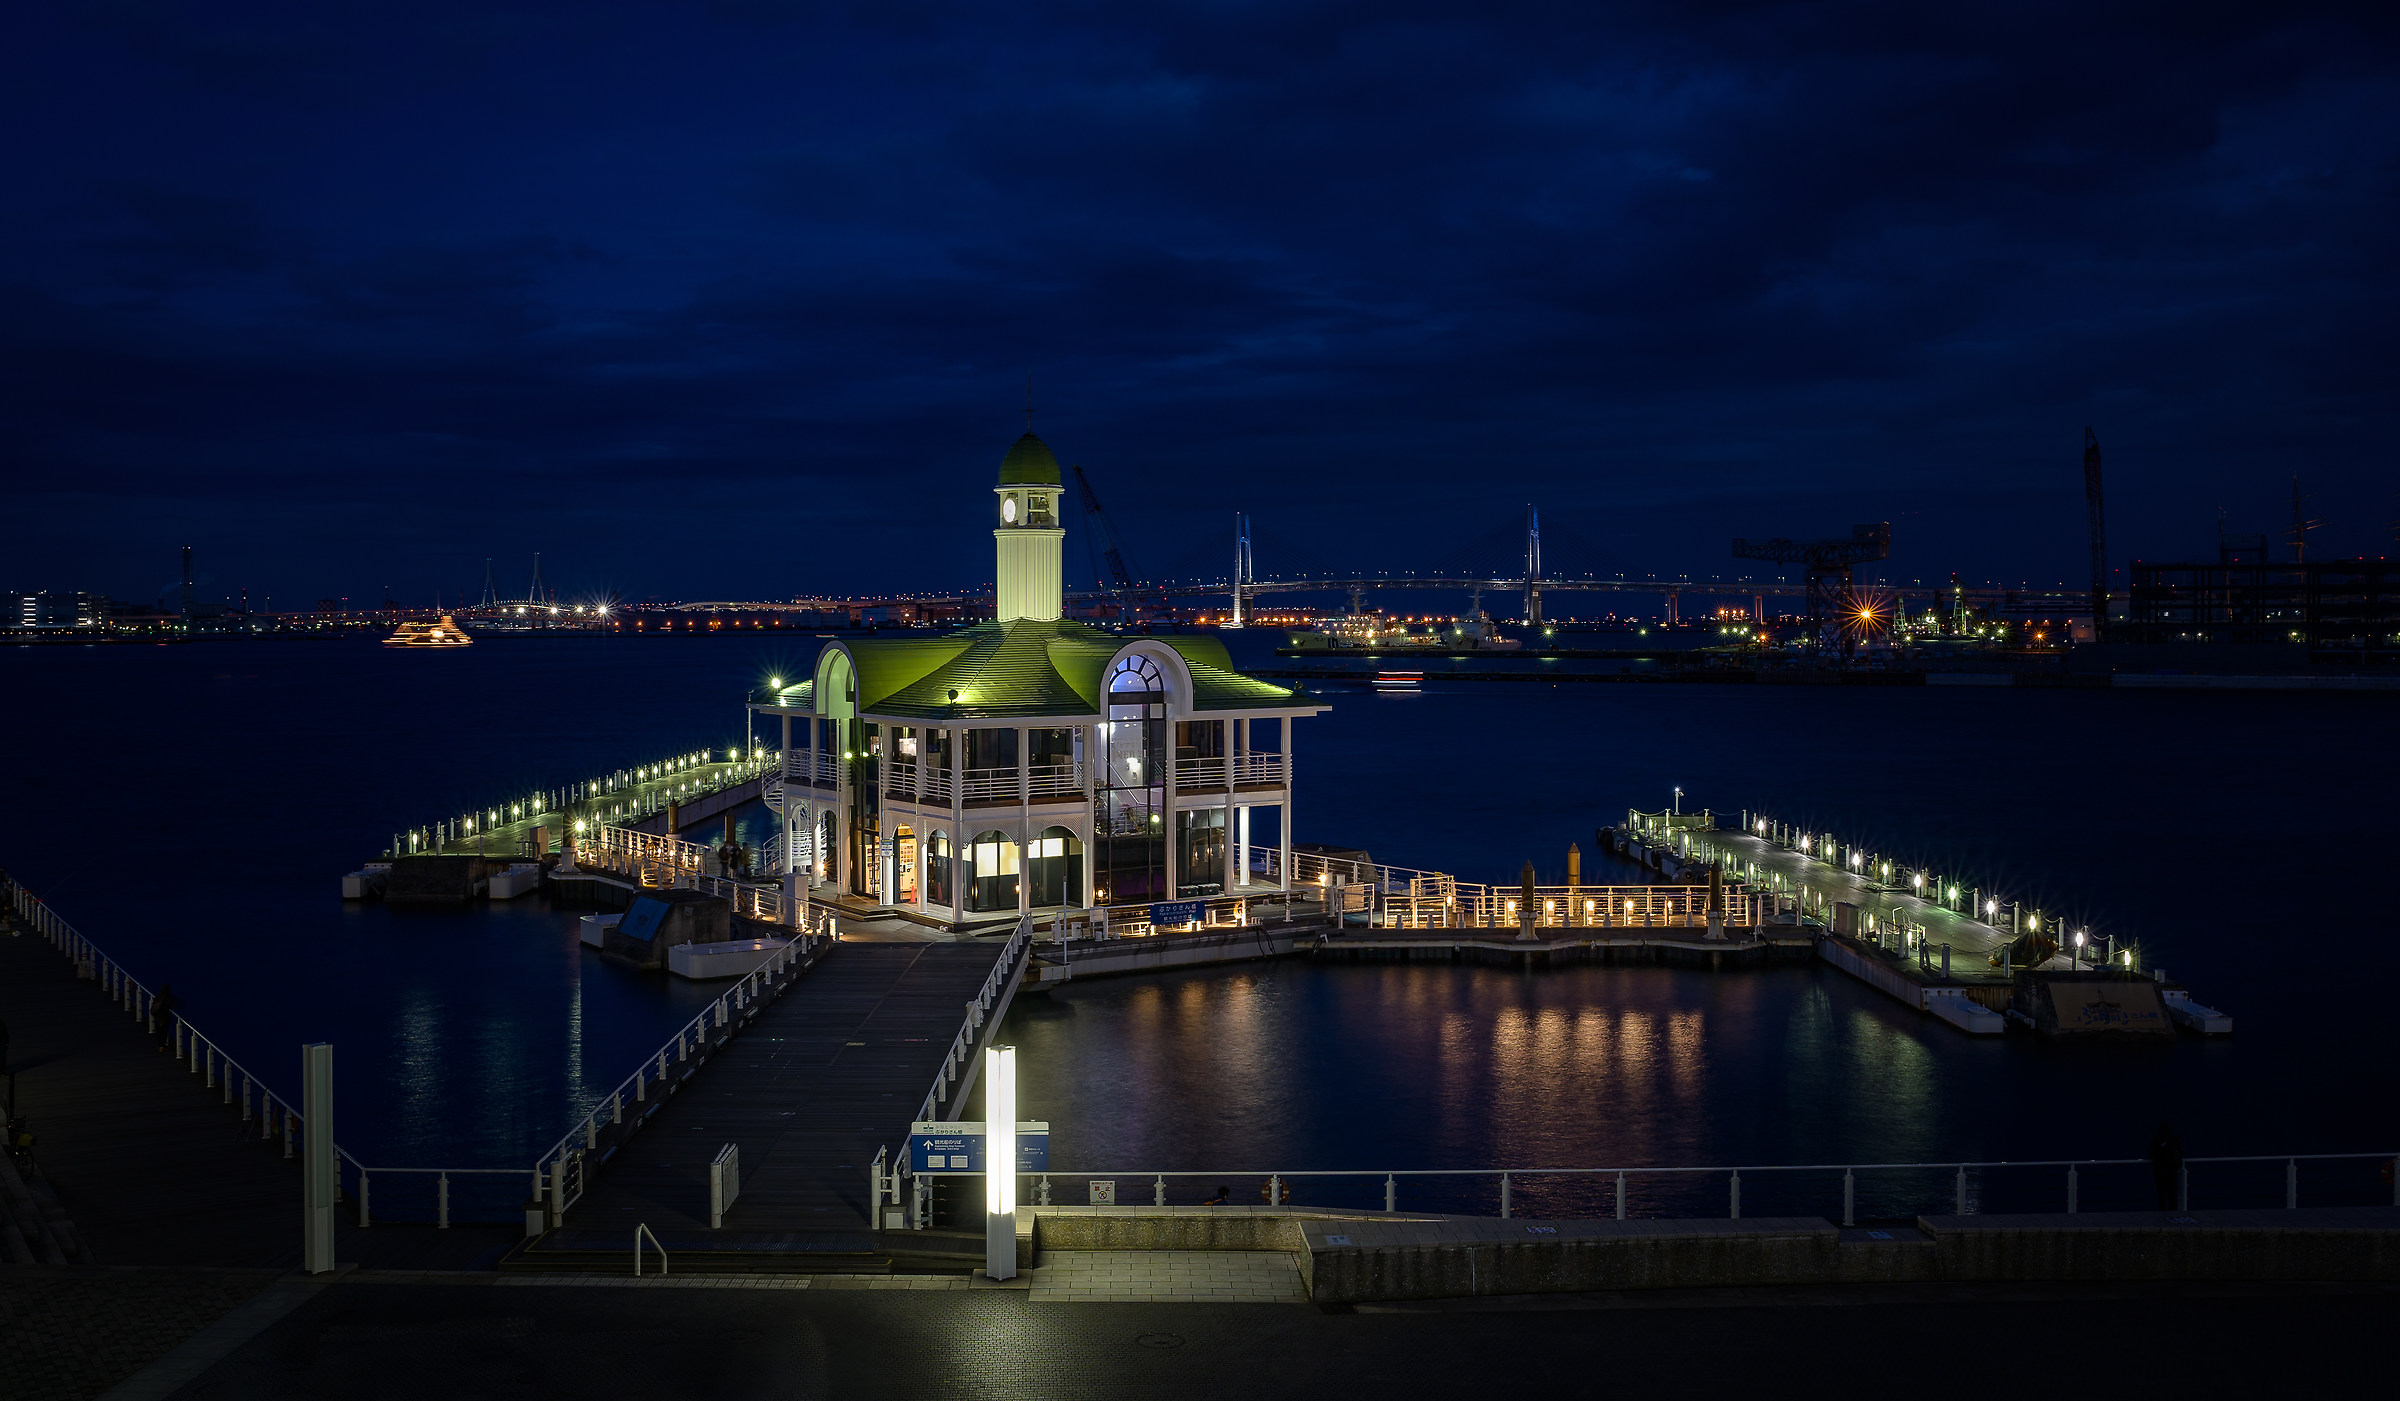 Yokohama Pier 21.......